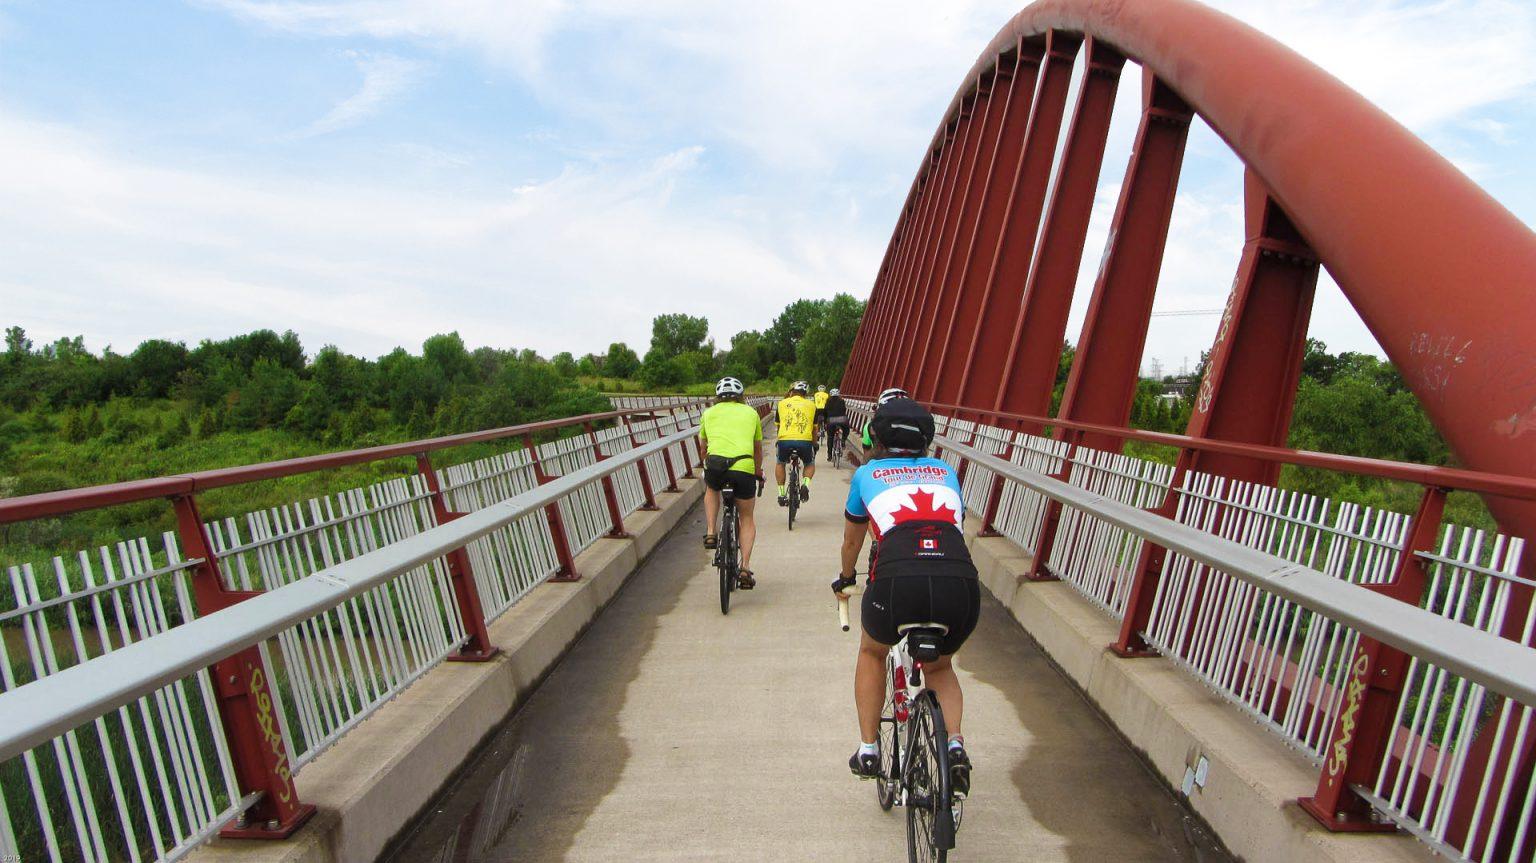 Hamilton-Harbour-riders-on-bridge